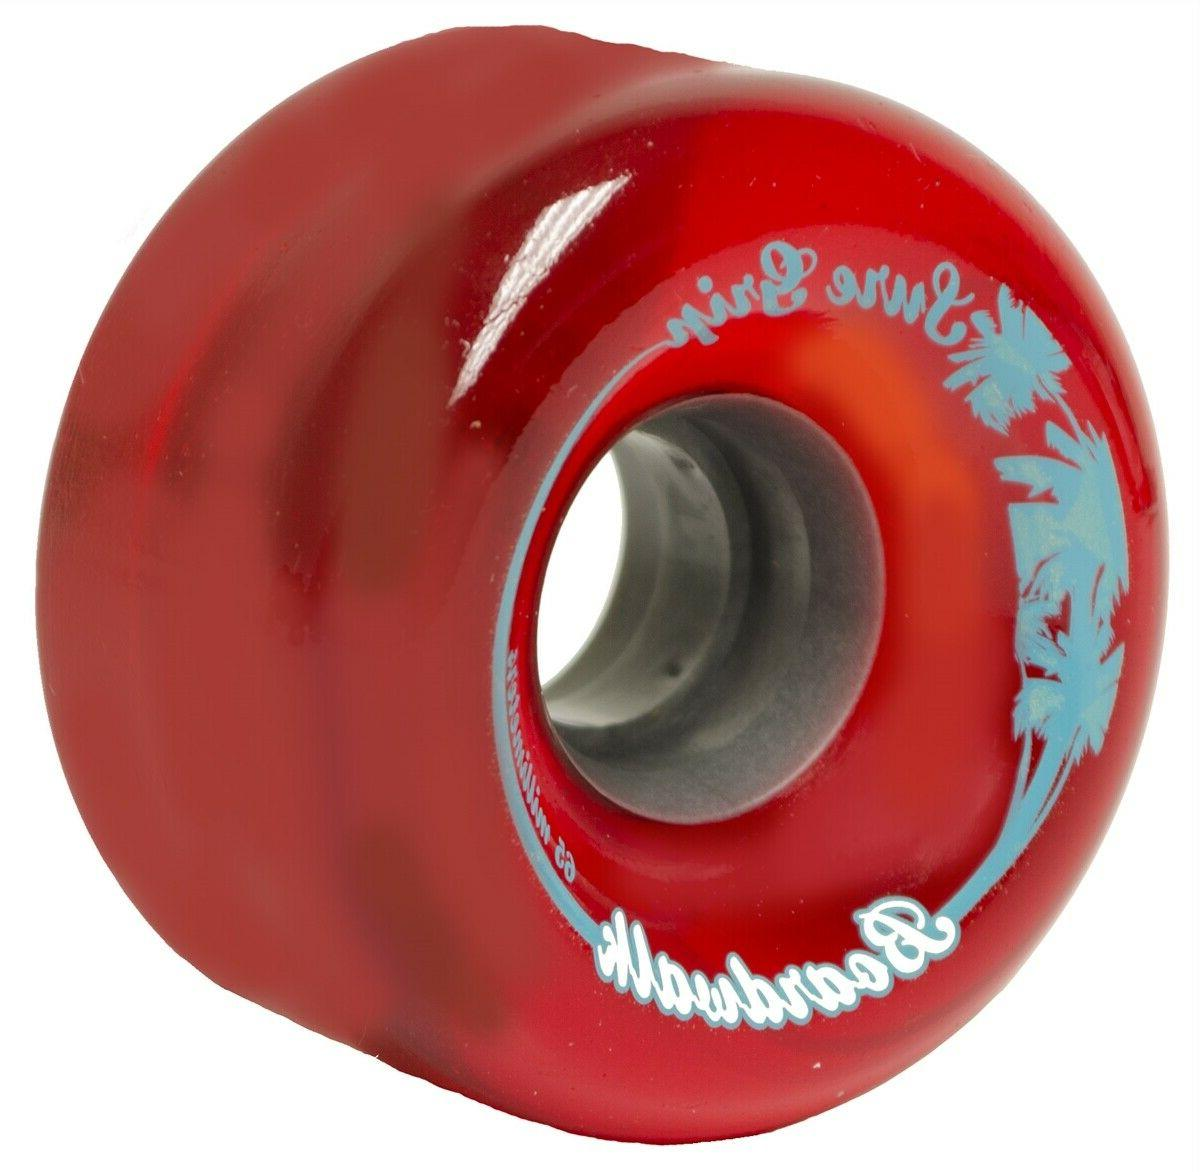 Brand New Red Boardwalk Outdoor Roller Skate Wheels 65mm